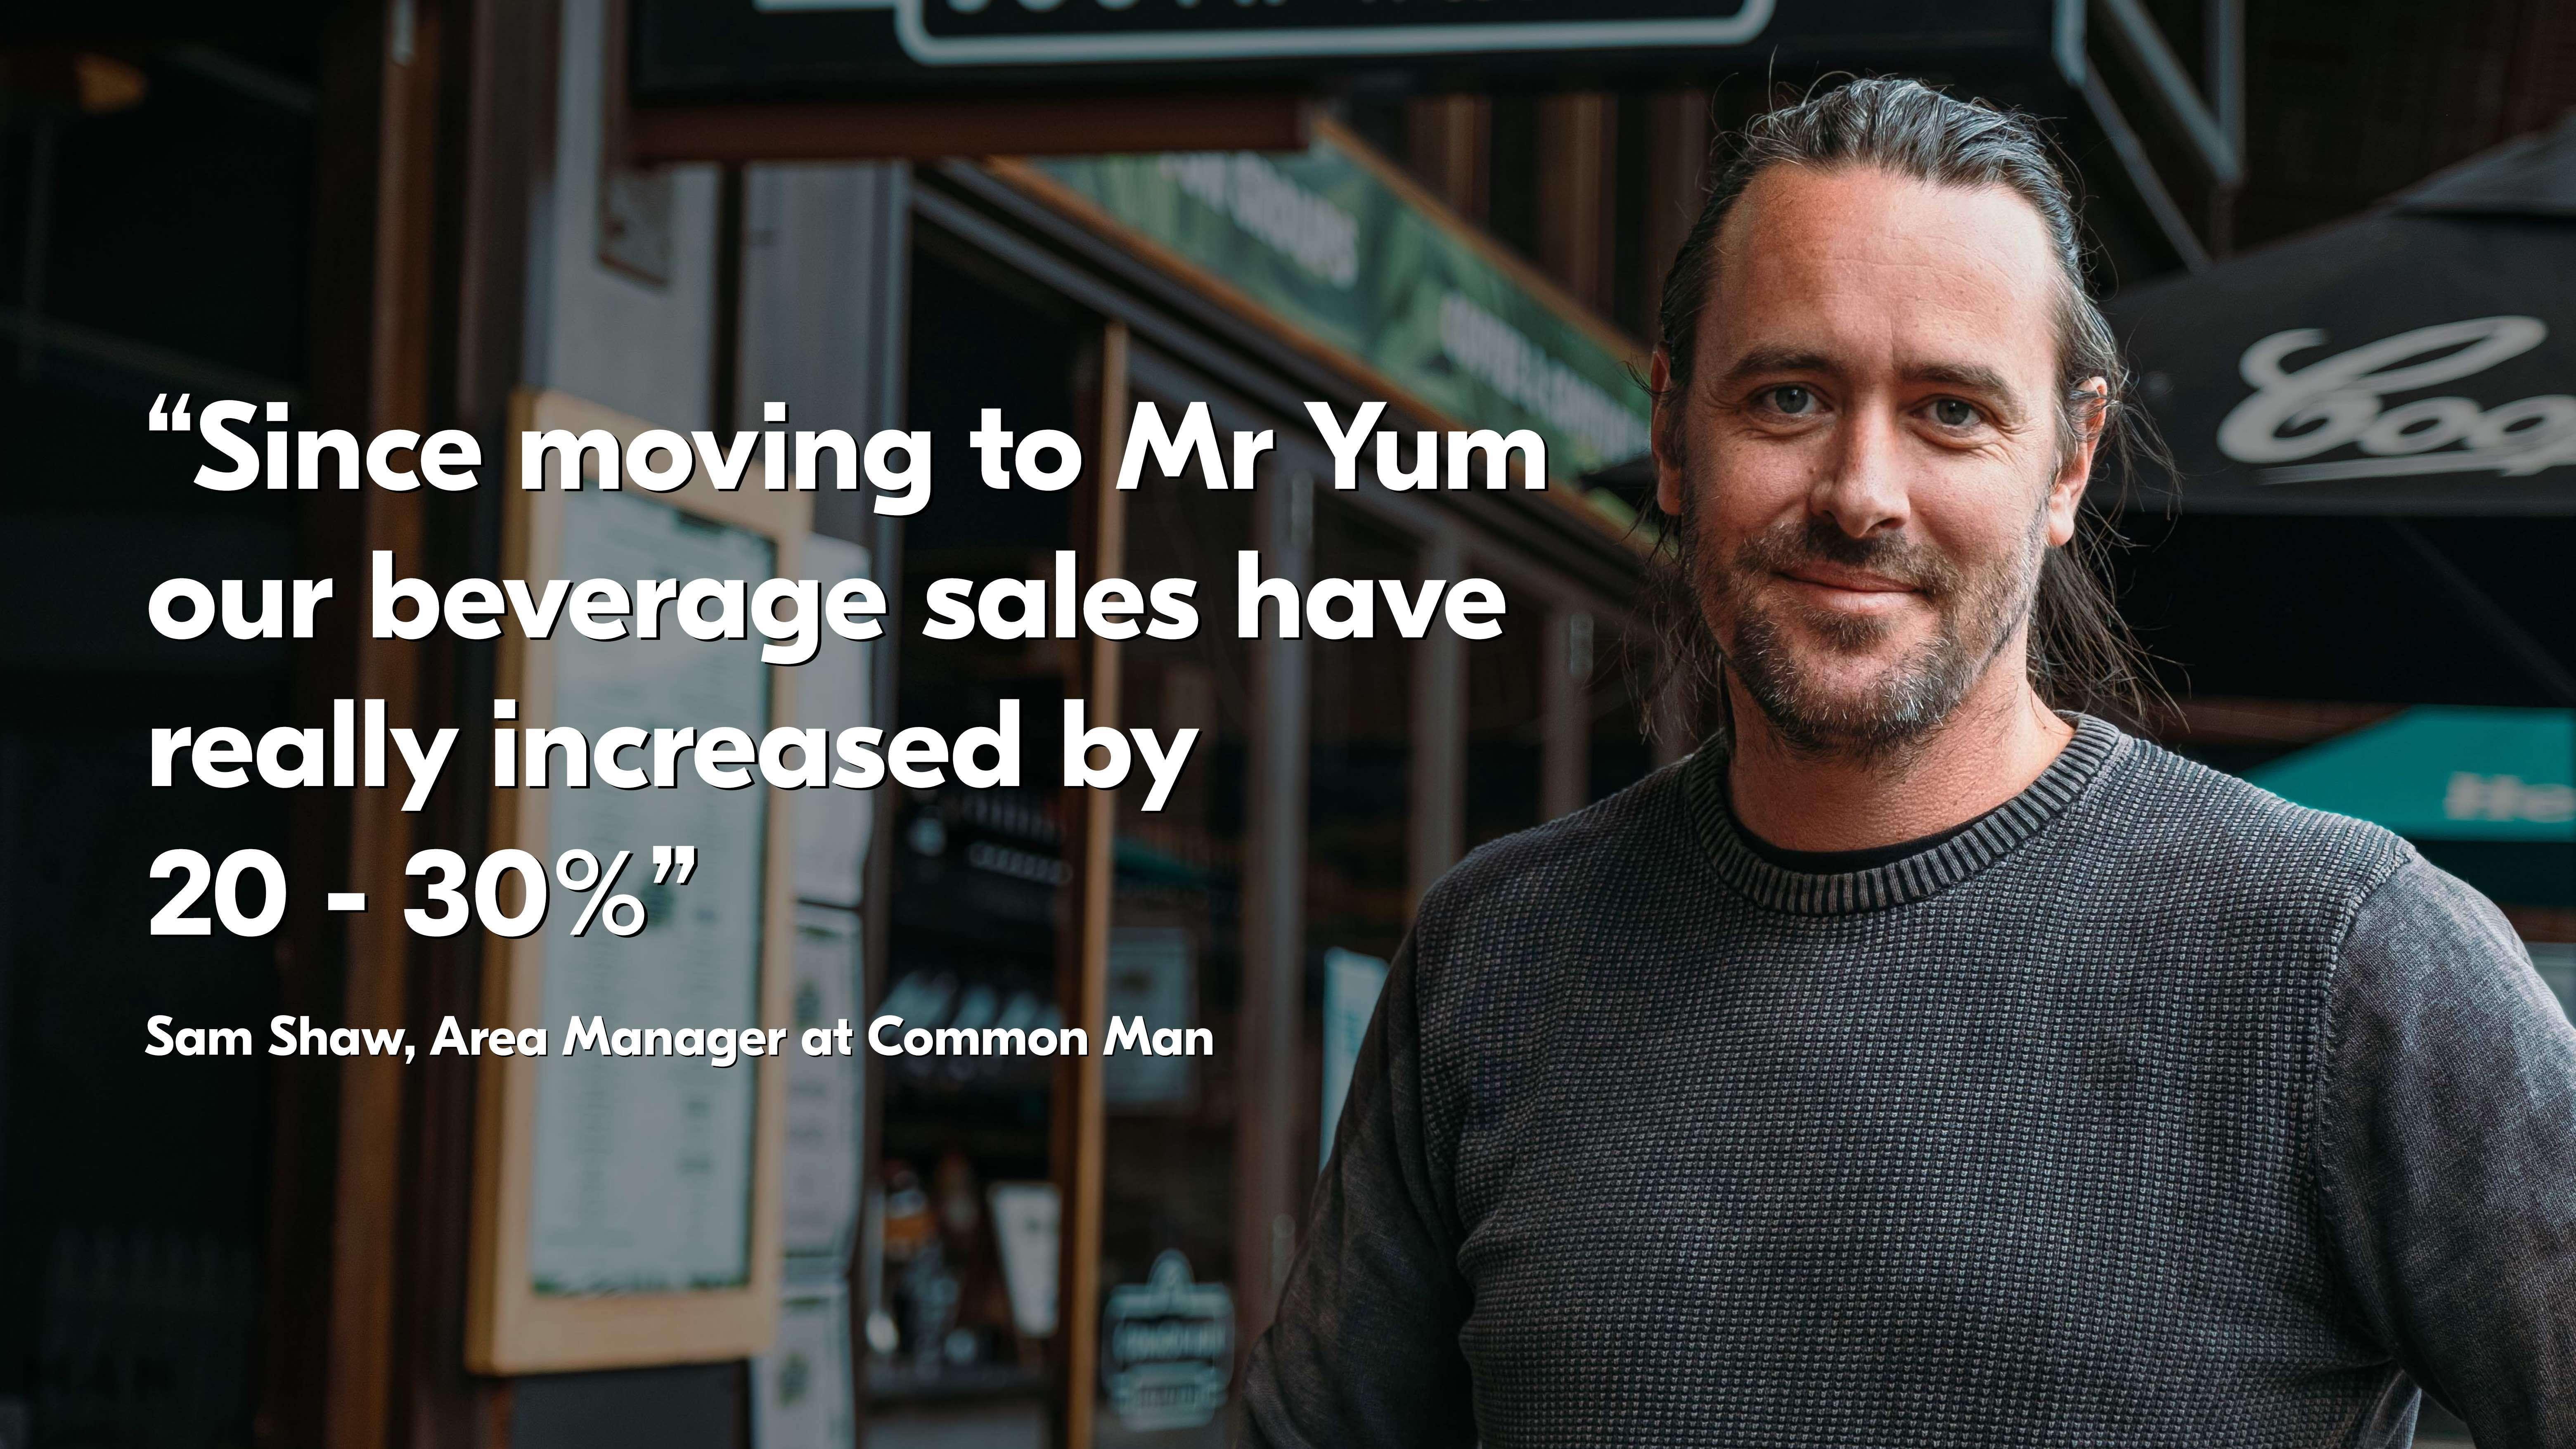 Venue owner Mr Yum